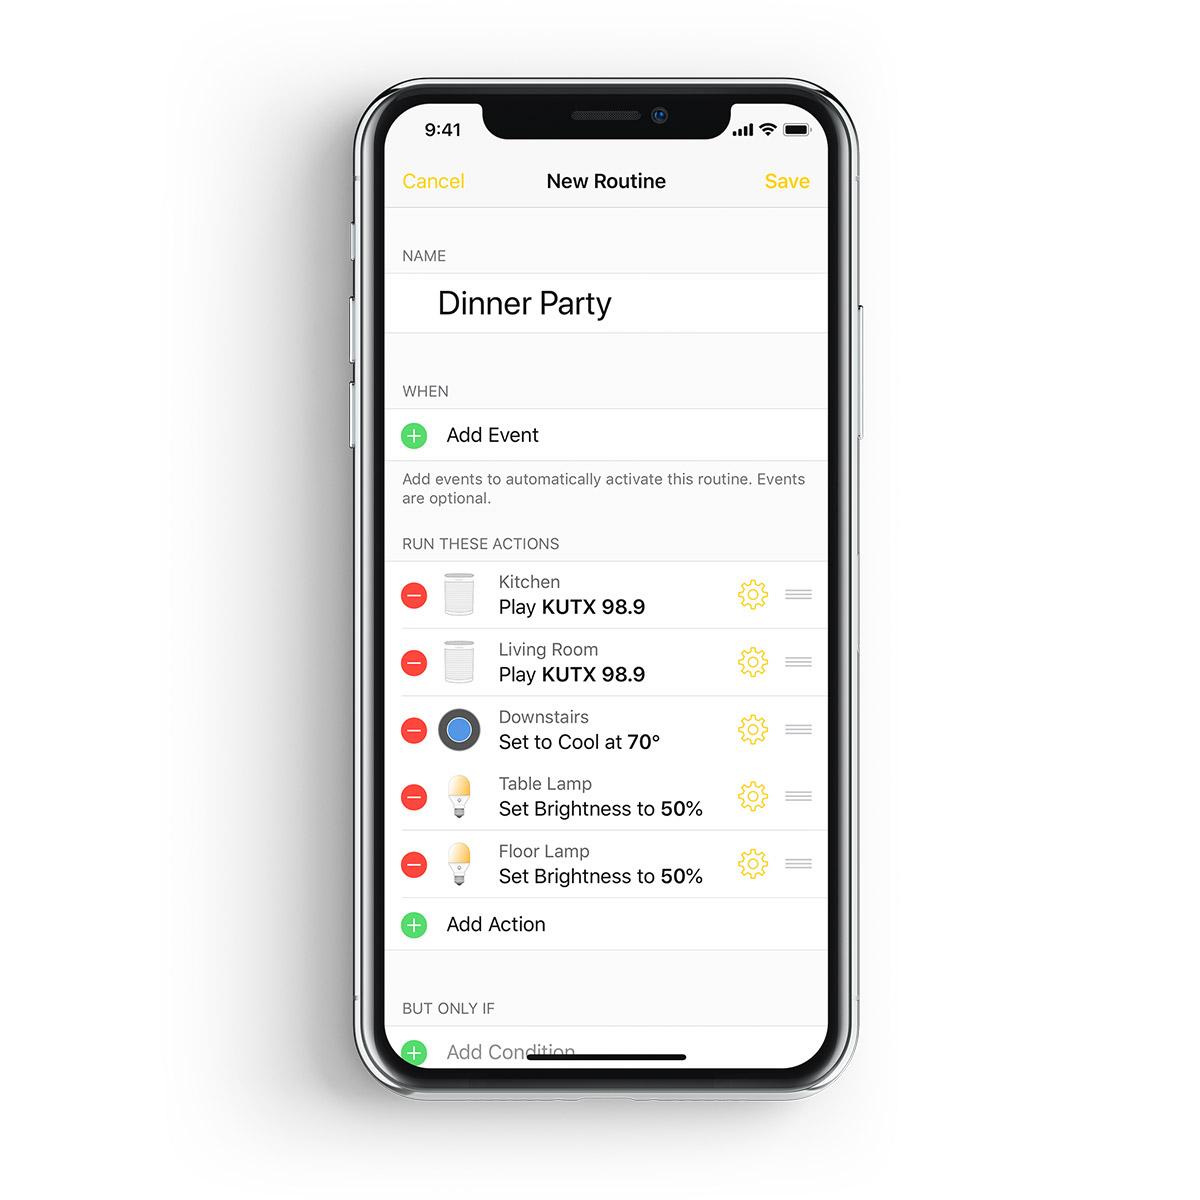 Yonomi - Yonomi App iOS Routines Dinner Party.jpg